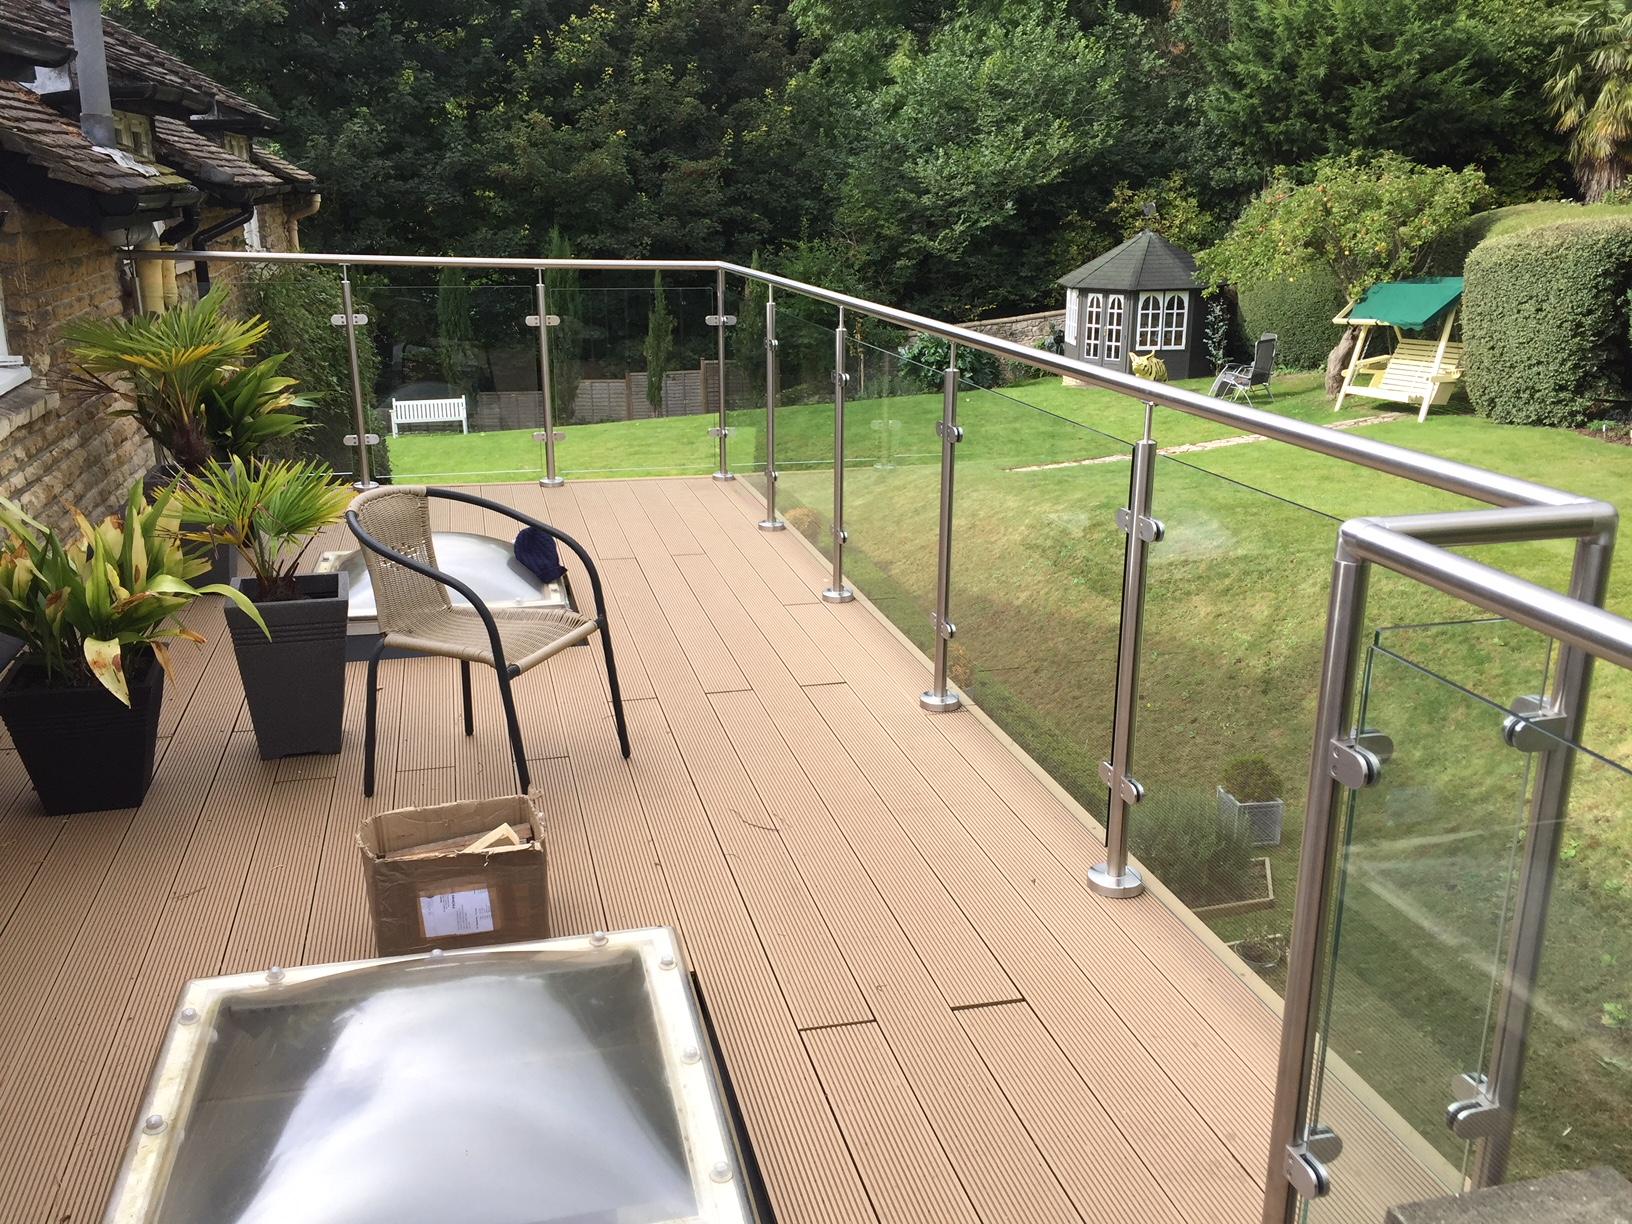 County Flat Roofing Uk Ltd Spra The Single Ply